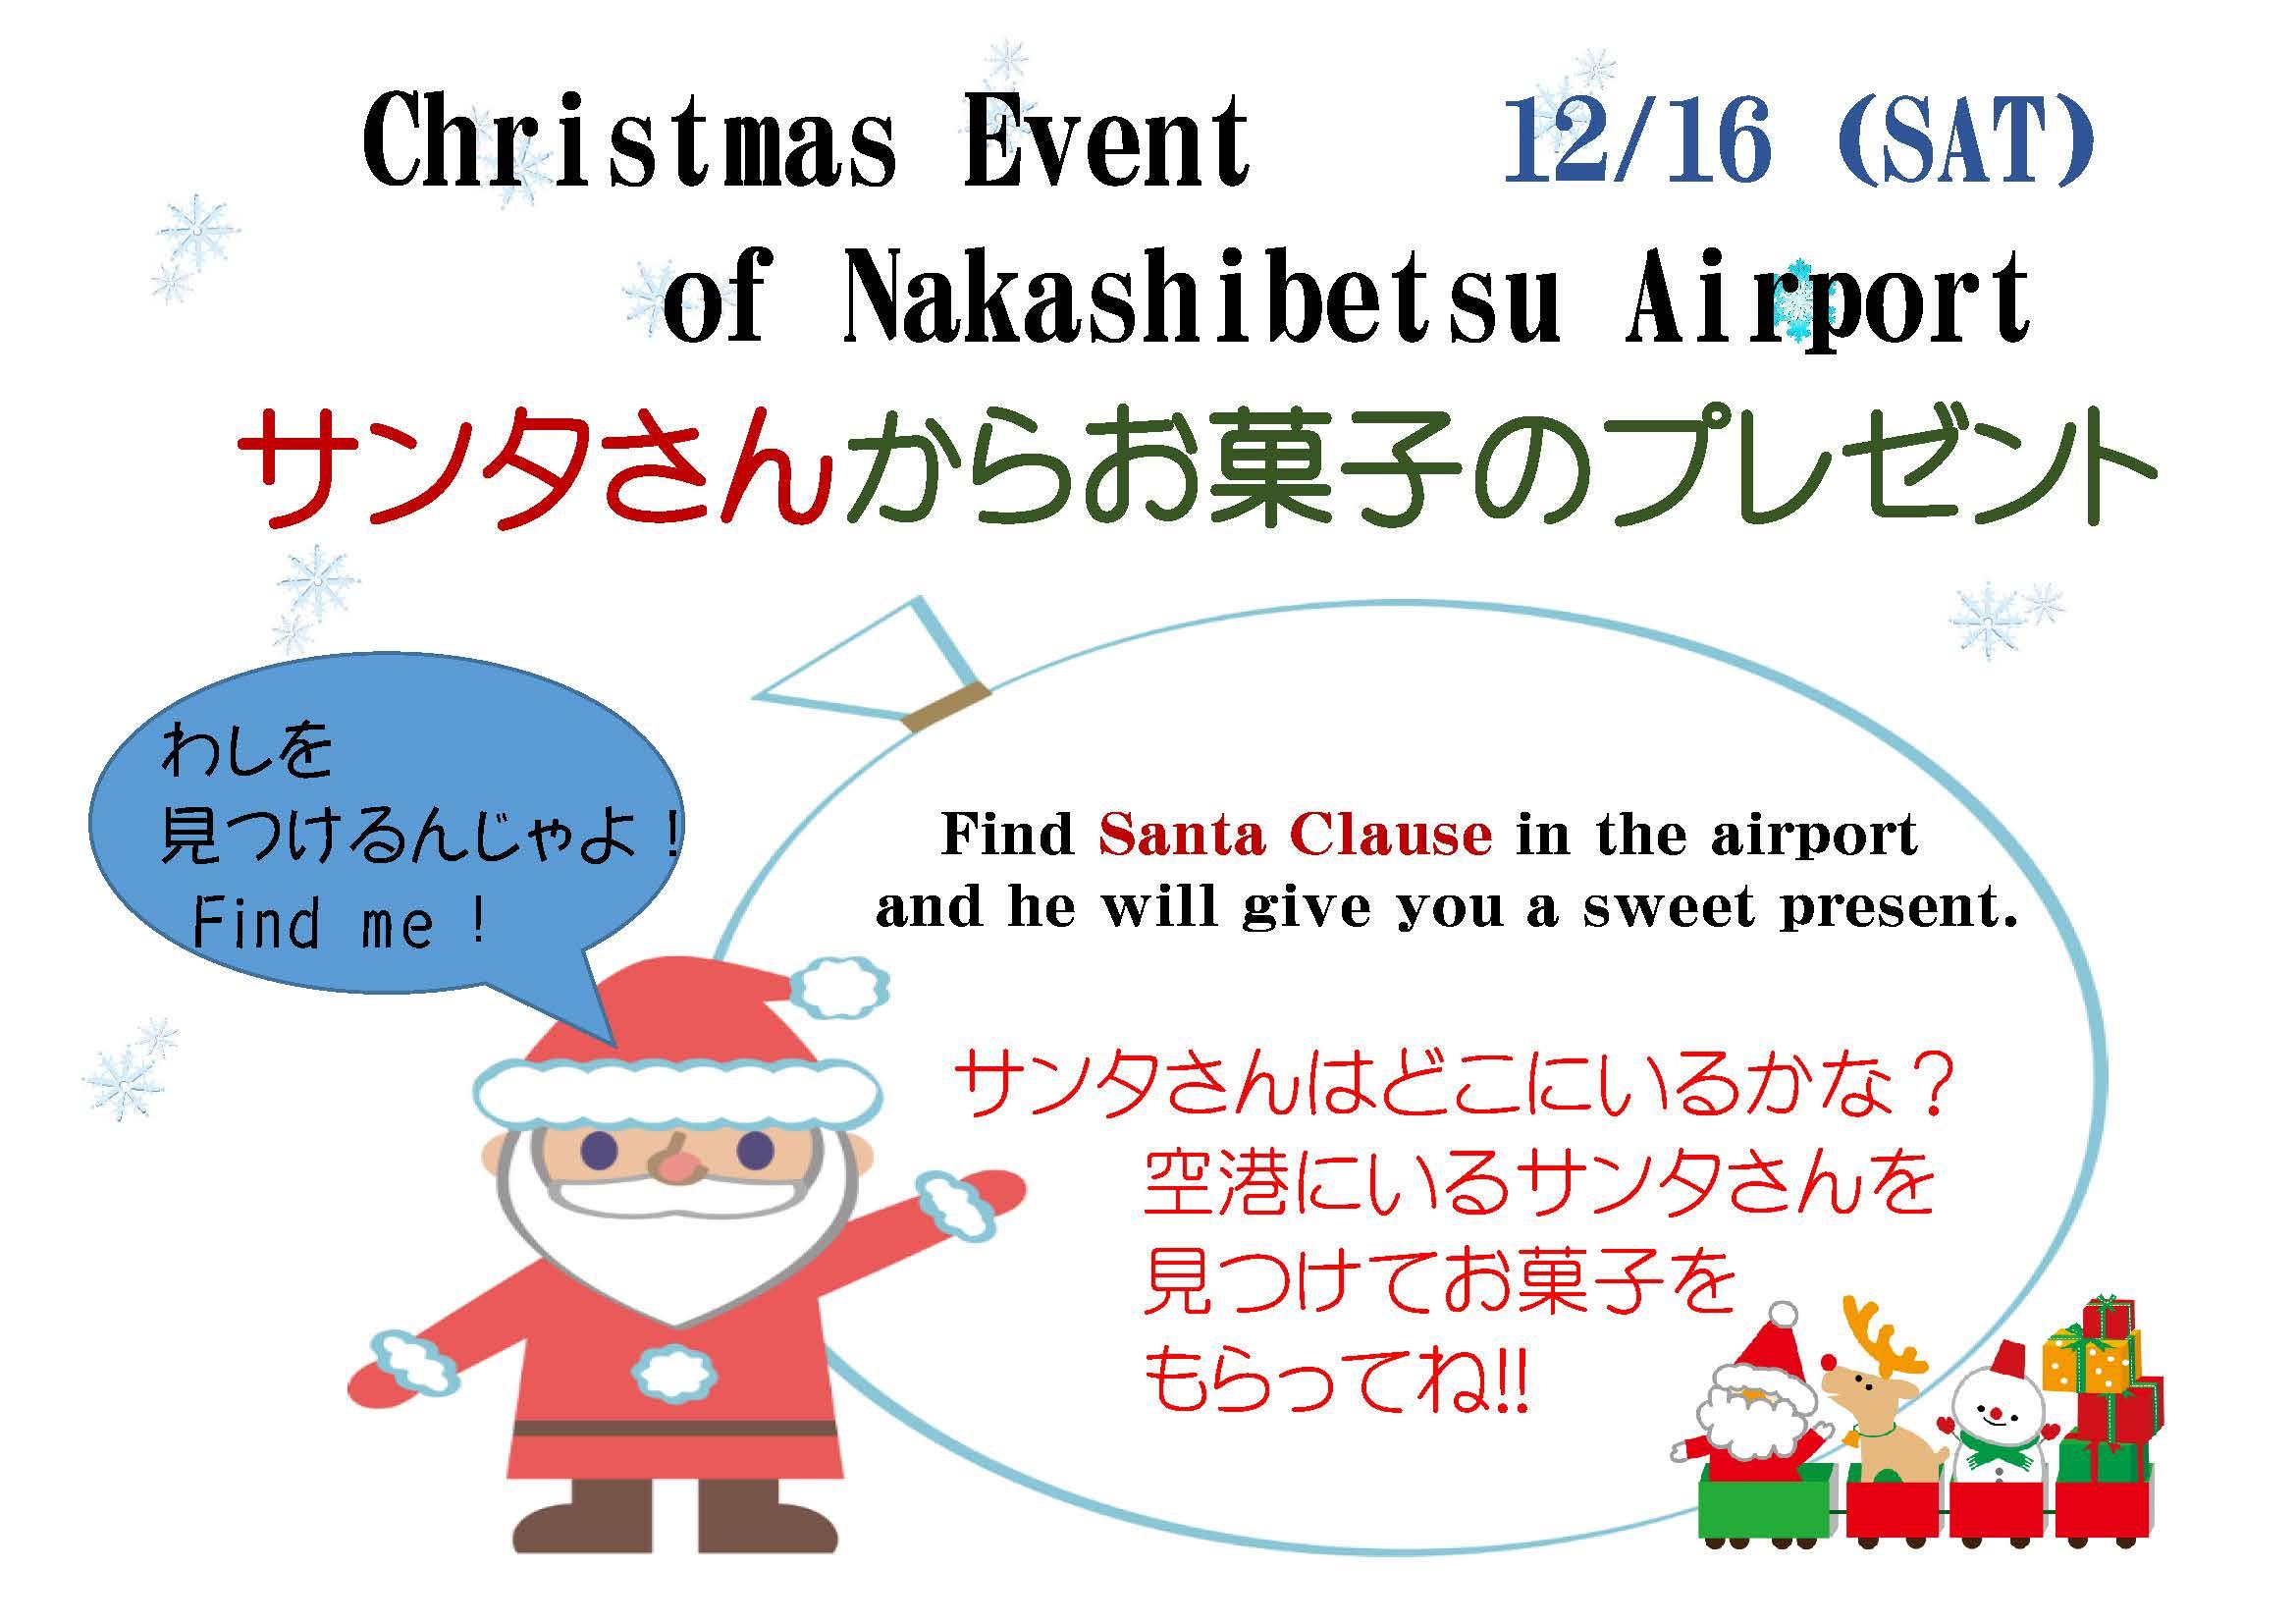 http://www.nakashibetsu-airport.jp/%E3%81%8A%E8%8F%93%E5%AD%90%E3%81%AE%E3%83%97%E3%83%AC%E3%82%BC%E3%83%B3%E3%83%881_%E3%83%9A%E3%83%BC%E3%82%B8_1.jpg